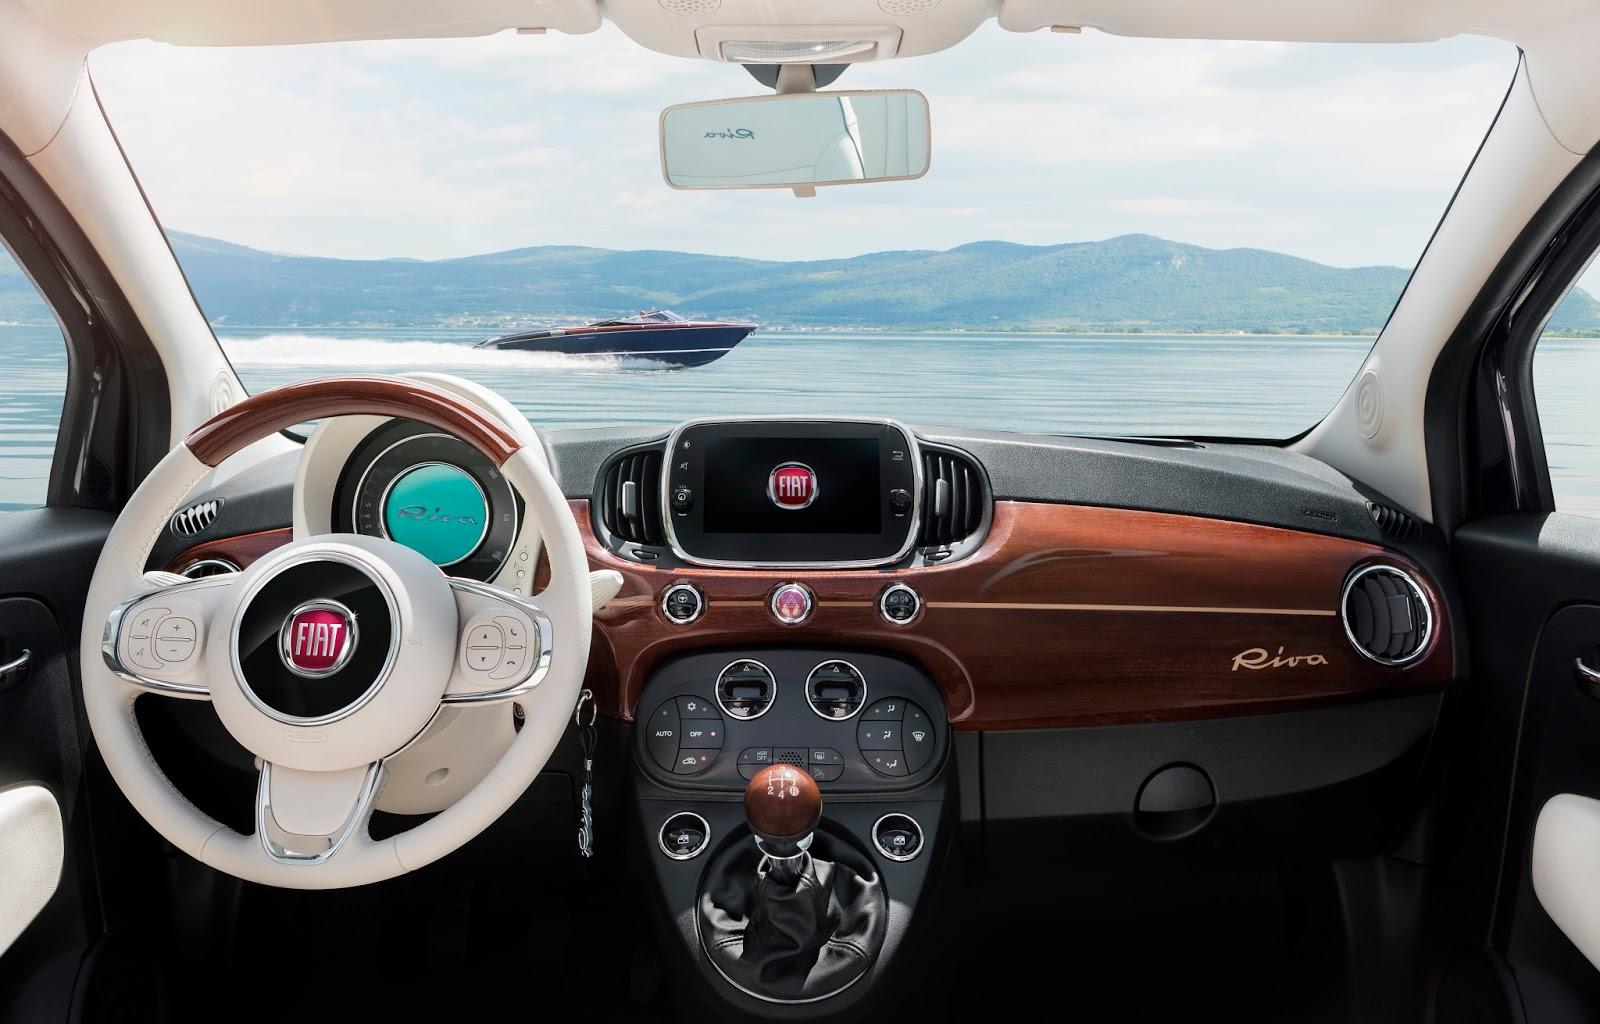 160627 Fiat 500 Riva 14 Fiat 500 Riva : Το κομψό έγινε και πολυτελές Fiat, Fiat 500, Fiat 500 Riva, Fiat 500C, Riva, supermini, videos